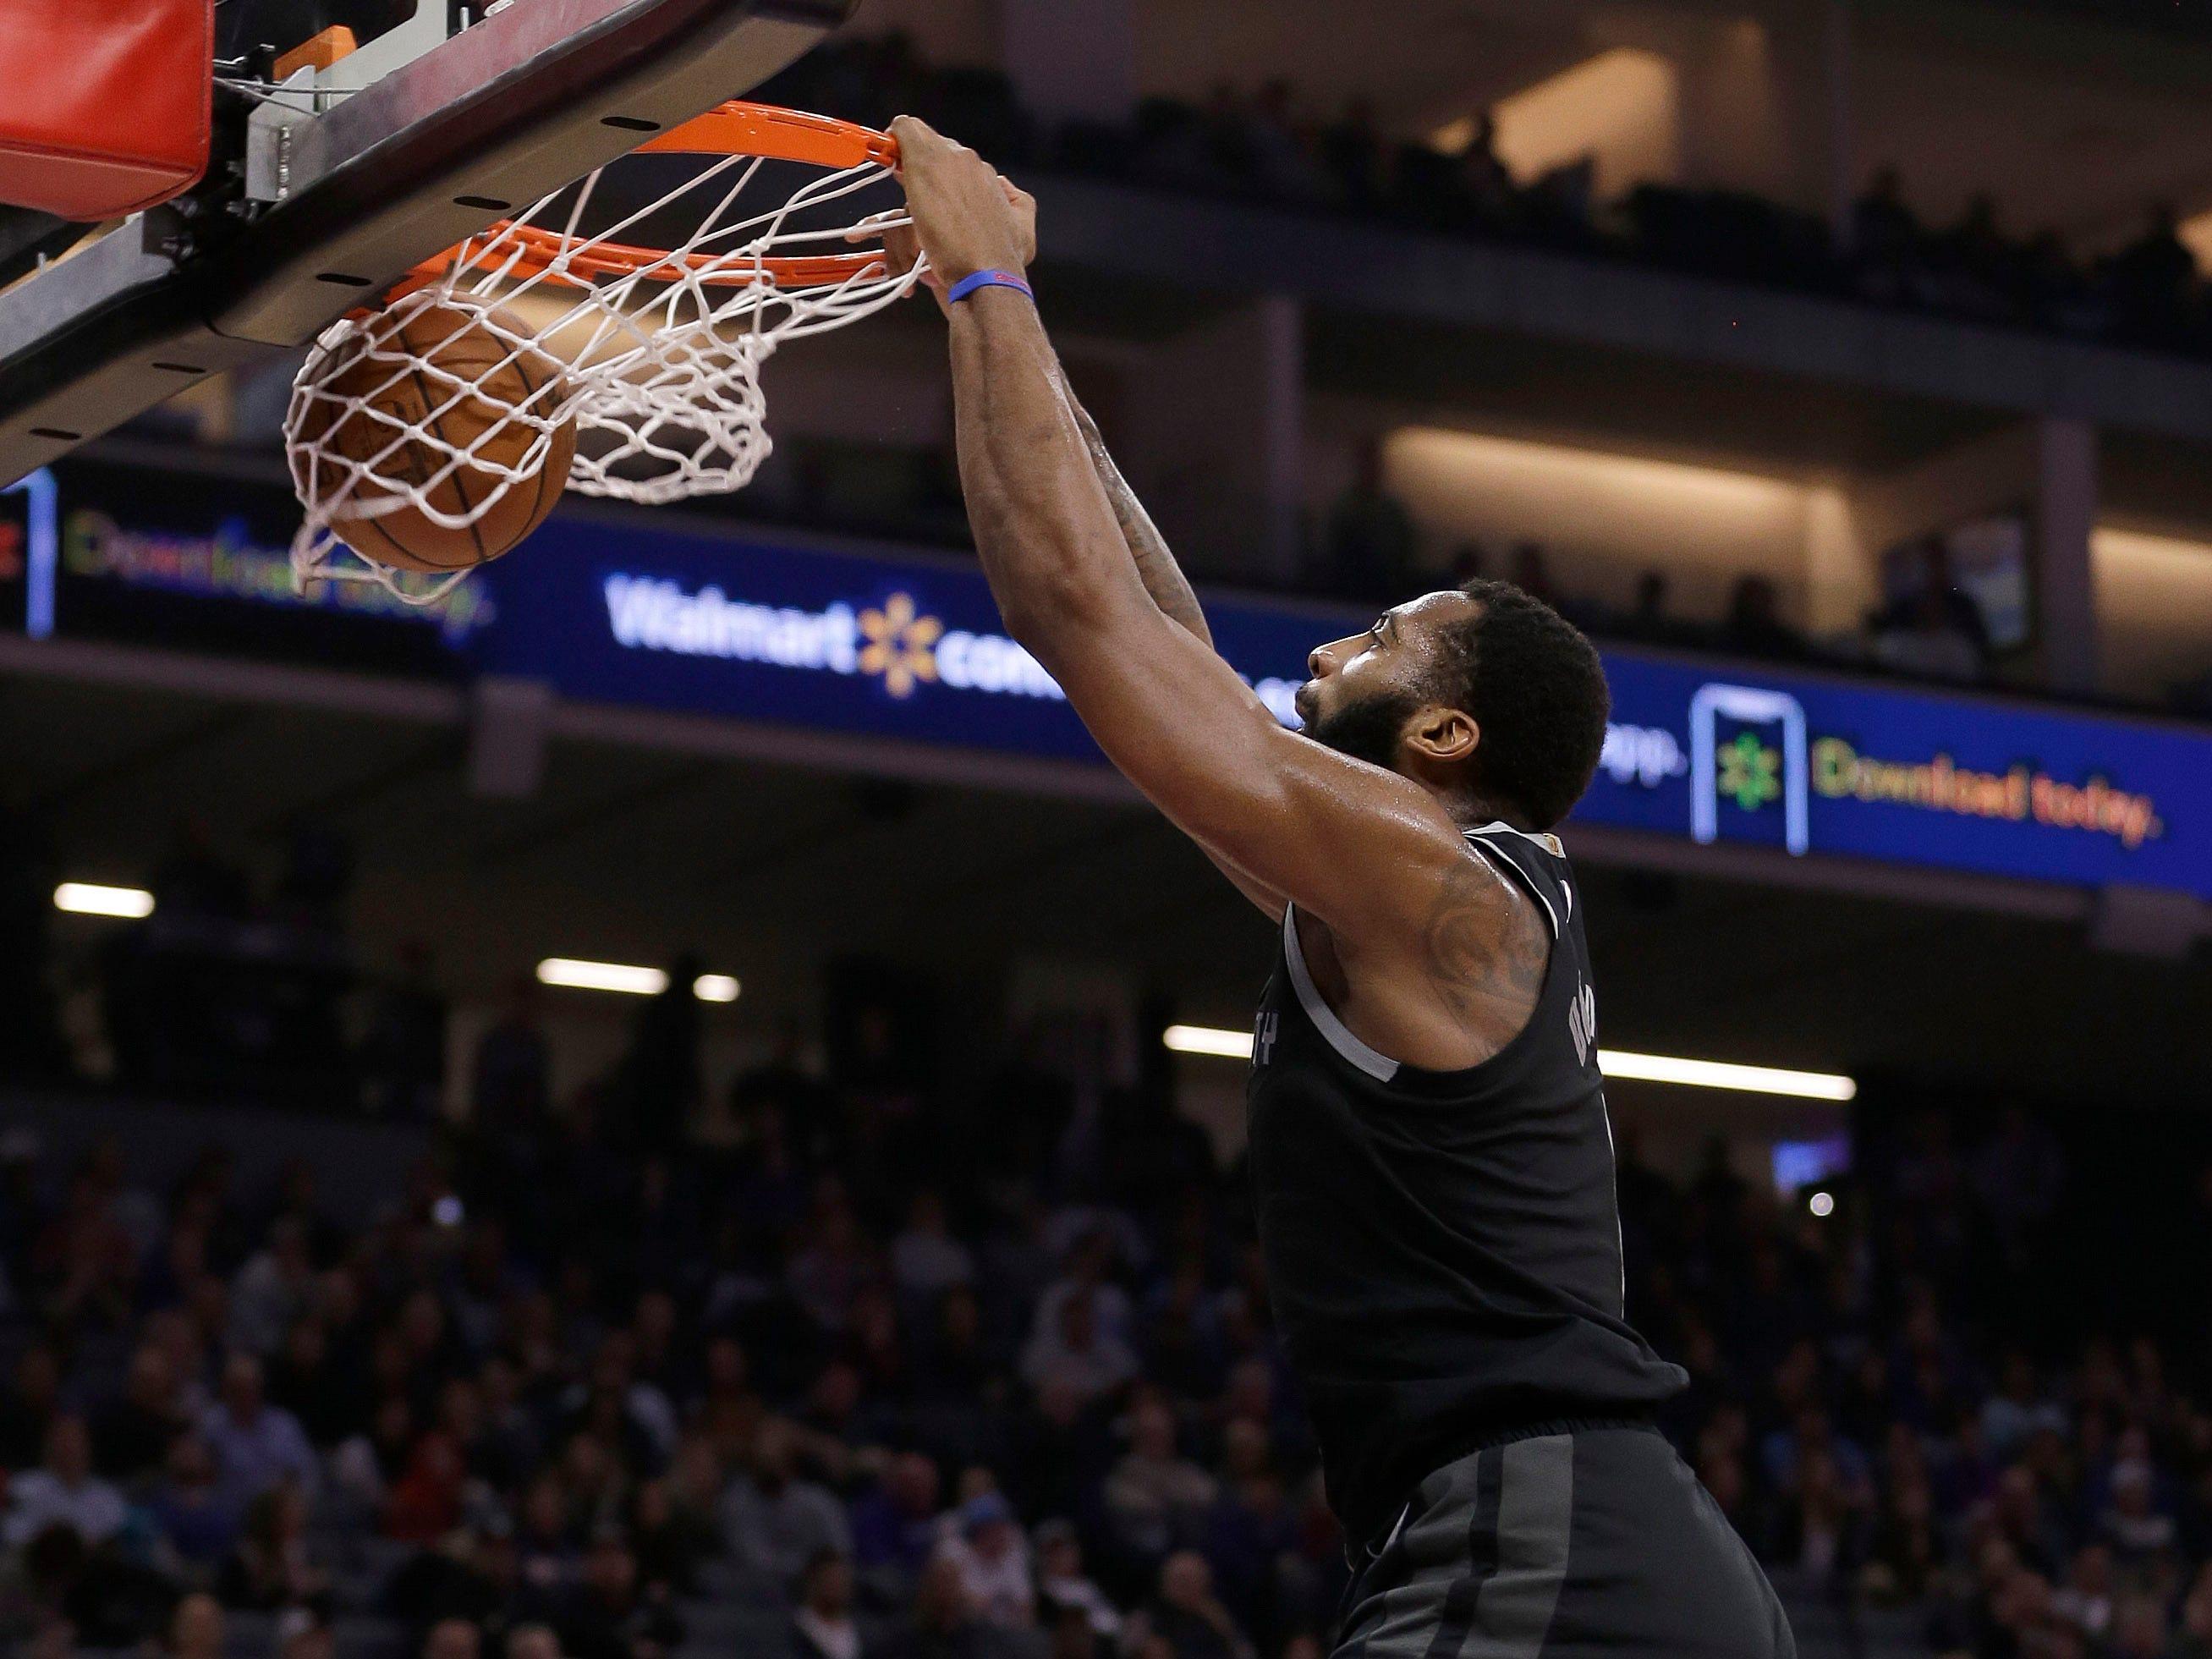 Detroit Pistons center Andre Drummond dunks as Sacramento Kings guard Bogdan Bogdanovic, right, watches during the first quarter of an NBA basketball game Thursday, Jan. 10, 2019, in Sacramento, Calif.